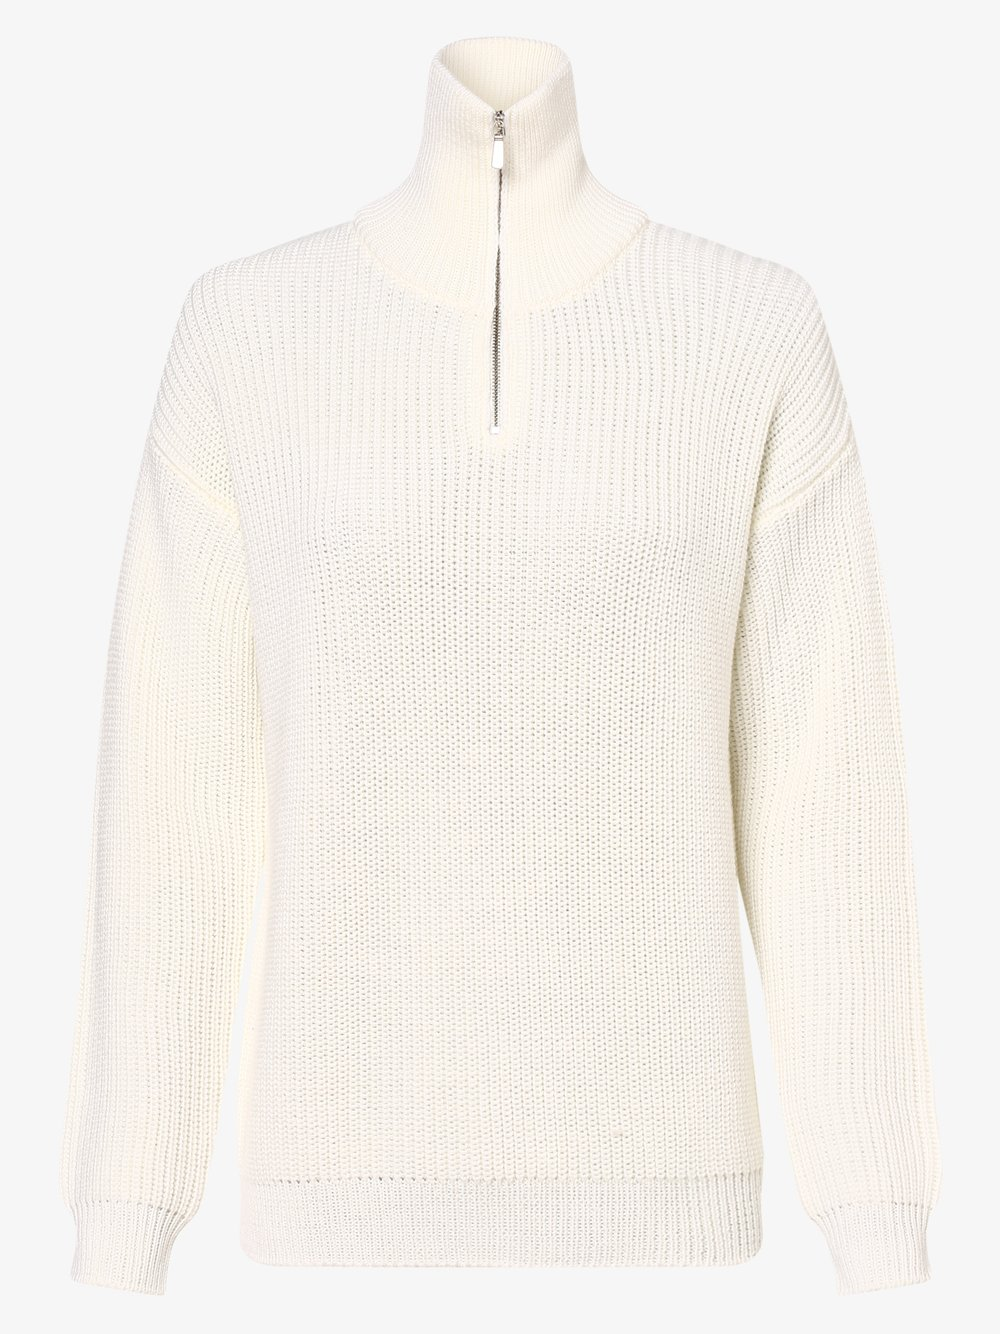 März – Sweter damski, biały Van Graaf 485983-0001-00440